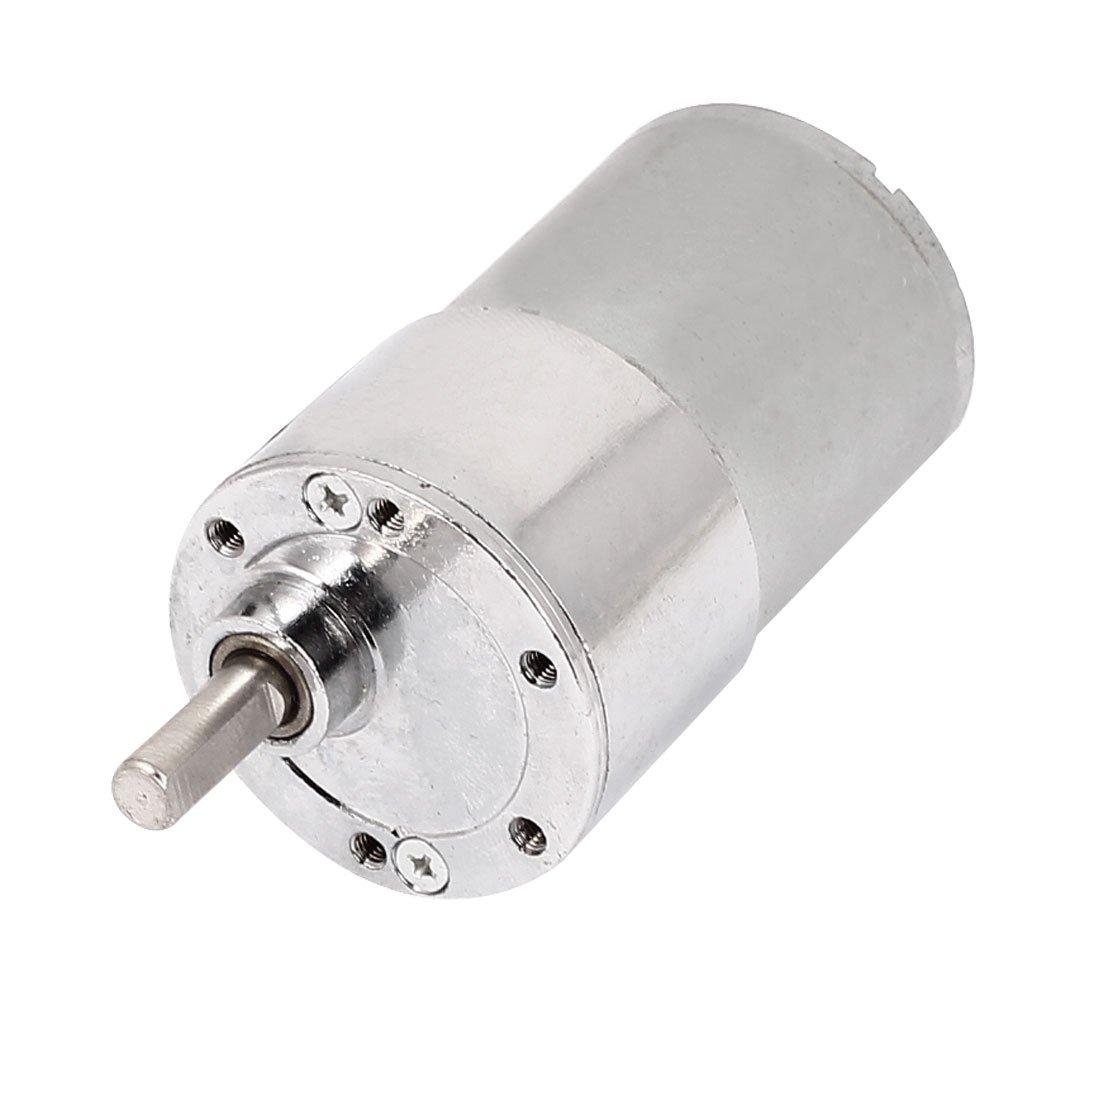 uxcell DC 12V 150RPM 6mm Shaft 37mm Body Dia Cylinder Shape Gear Box Motor